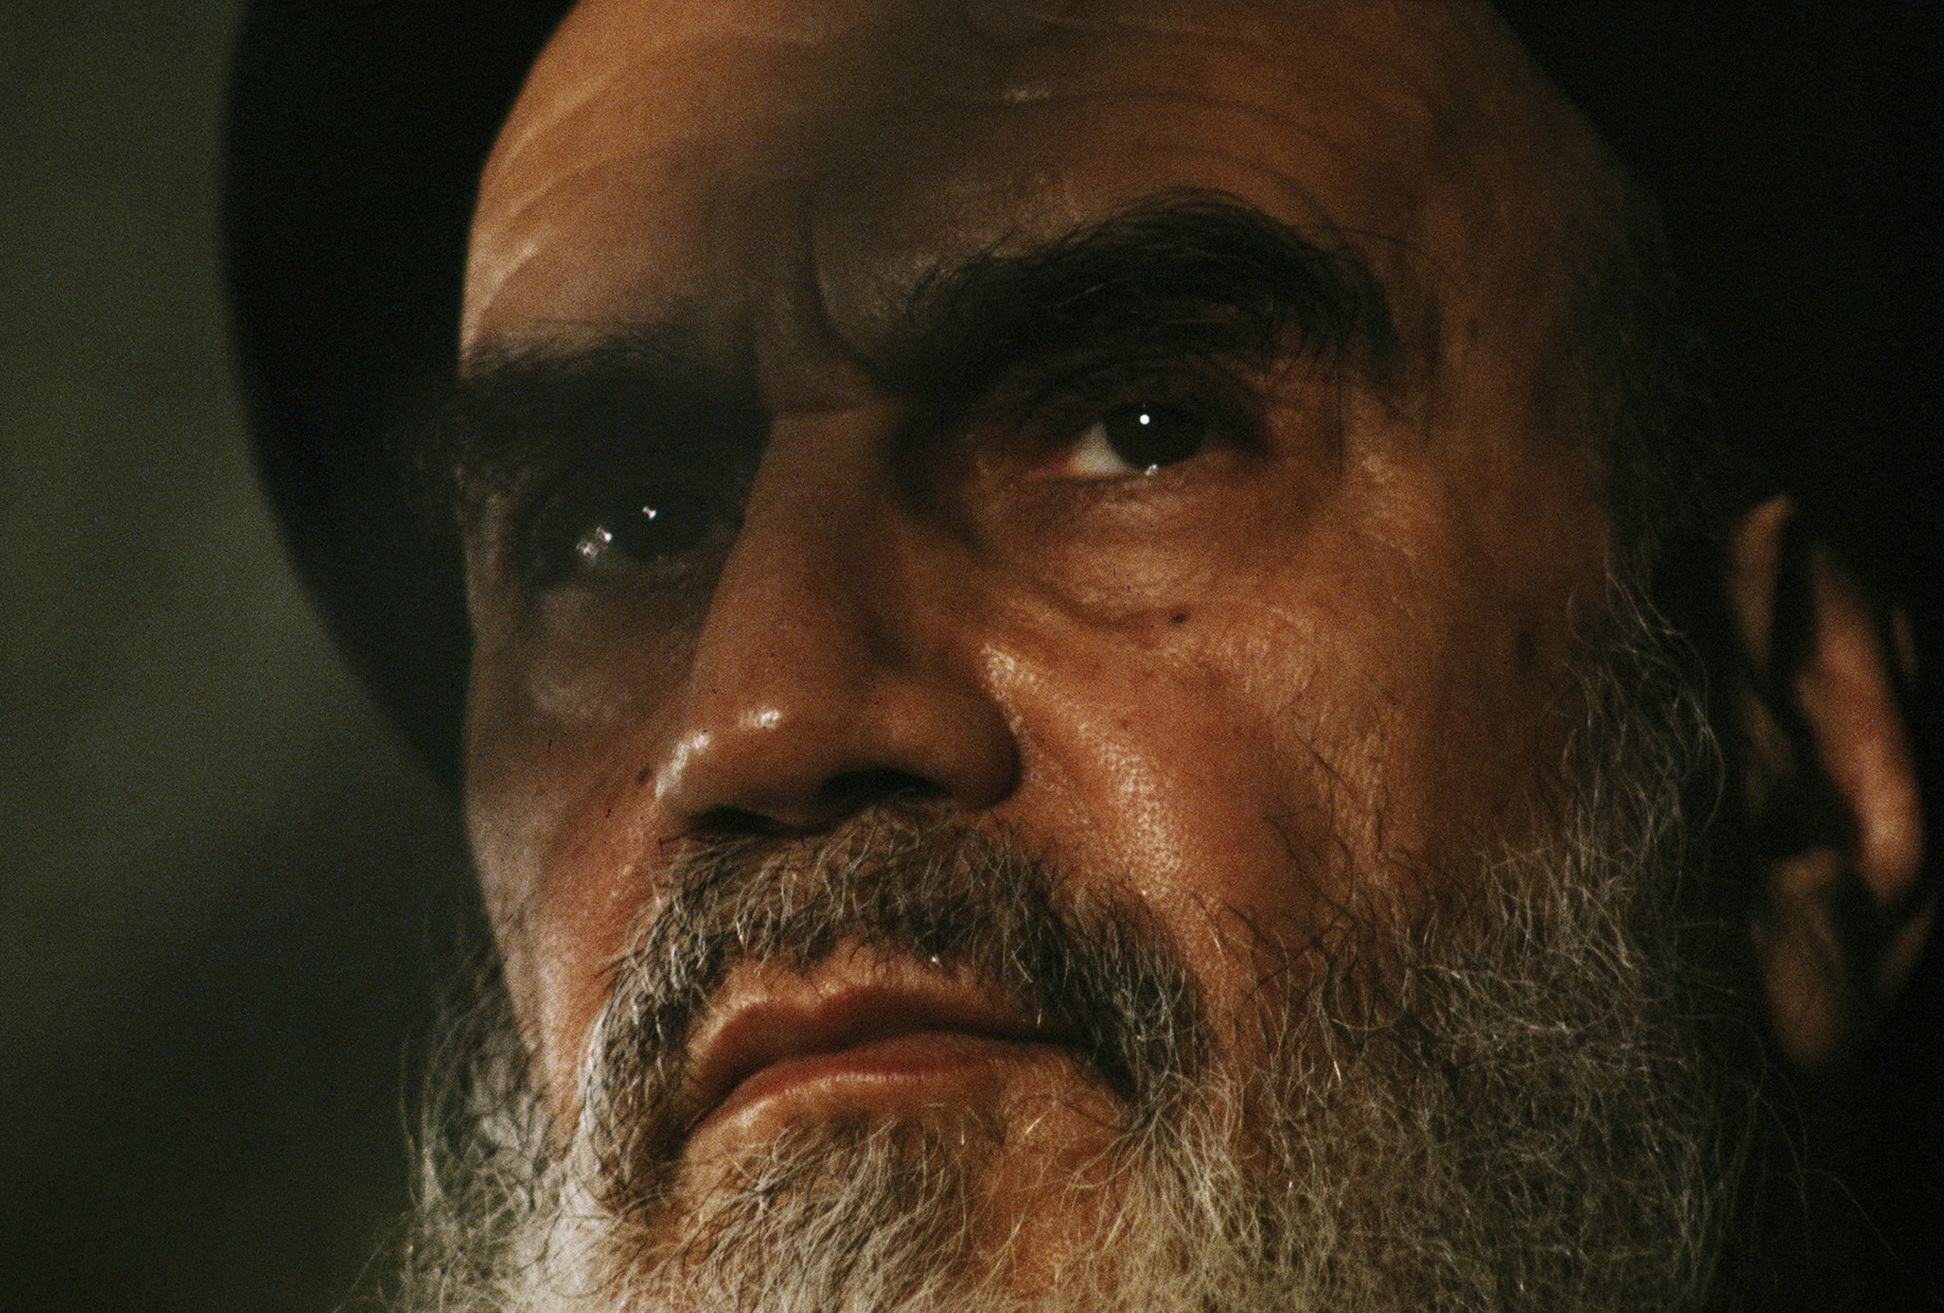 The Ayatollah Khomeini, Tehran, 1979. © 2015 David Burnett/Contact Press Images